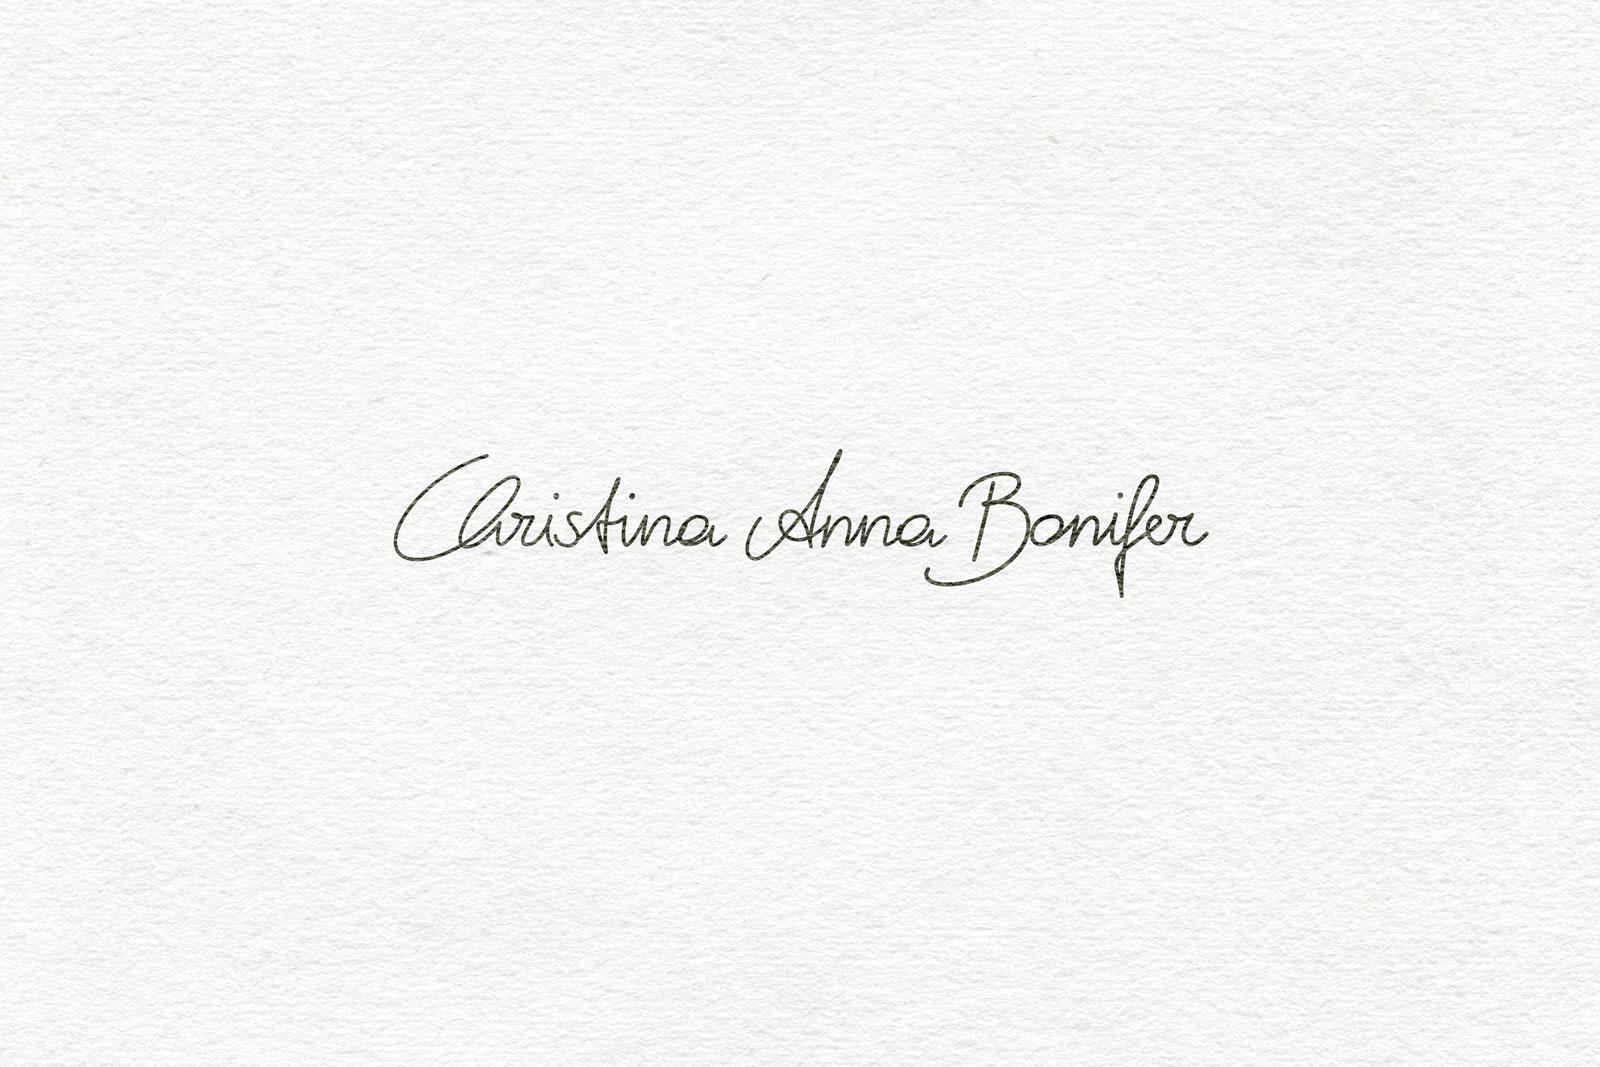 Logo Design Handschrift Unterschrift erstellen lassen